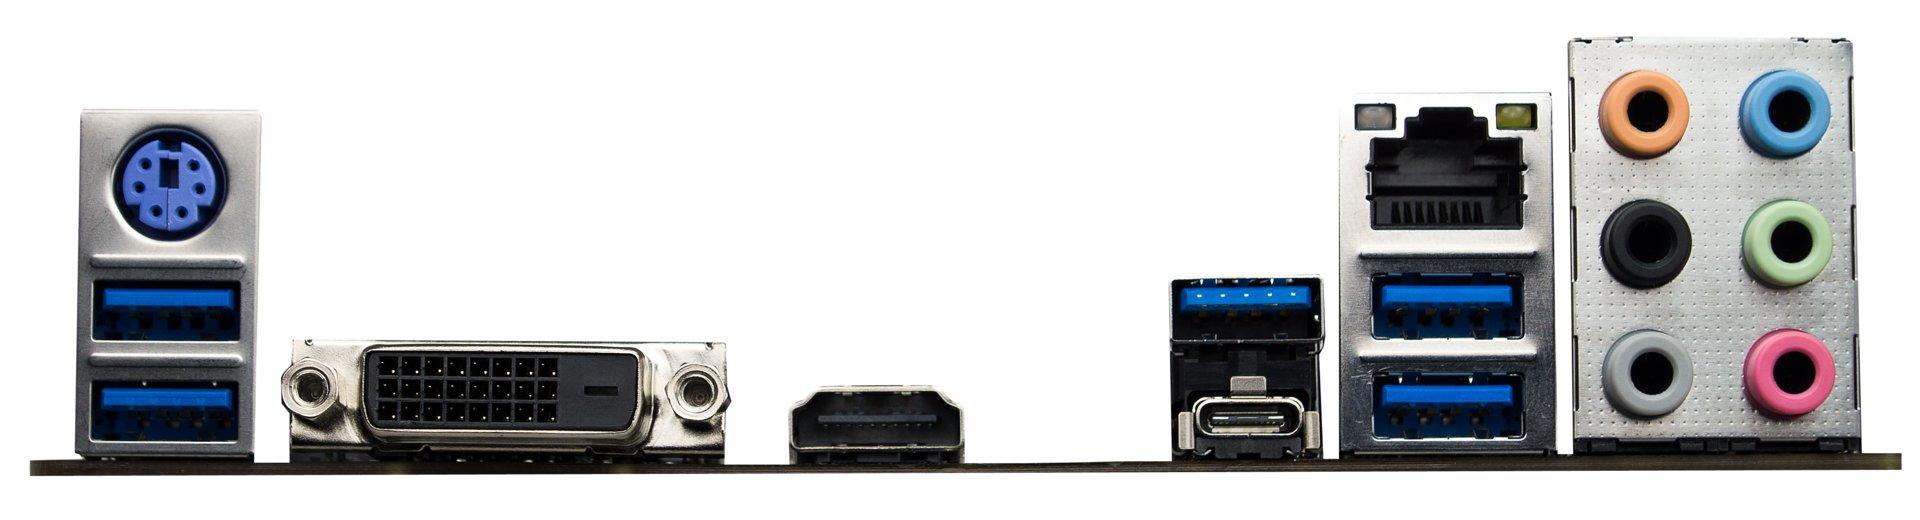 Biostar Racing X370GT5 – das I/O-Panel mit Anschlüssen